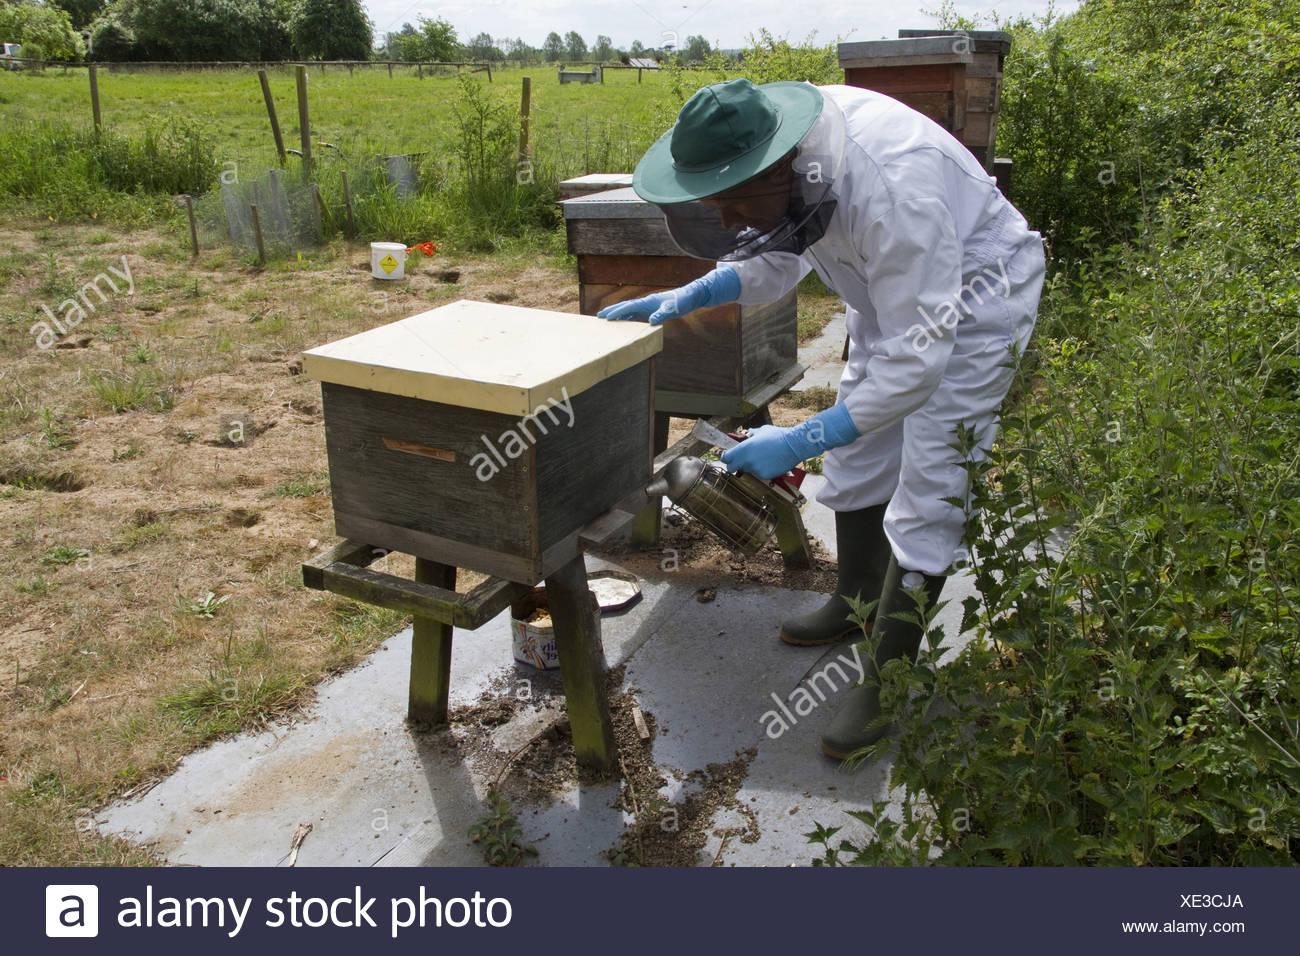 Using smoker at bee hive entrance to brood box to pacify